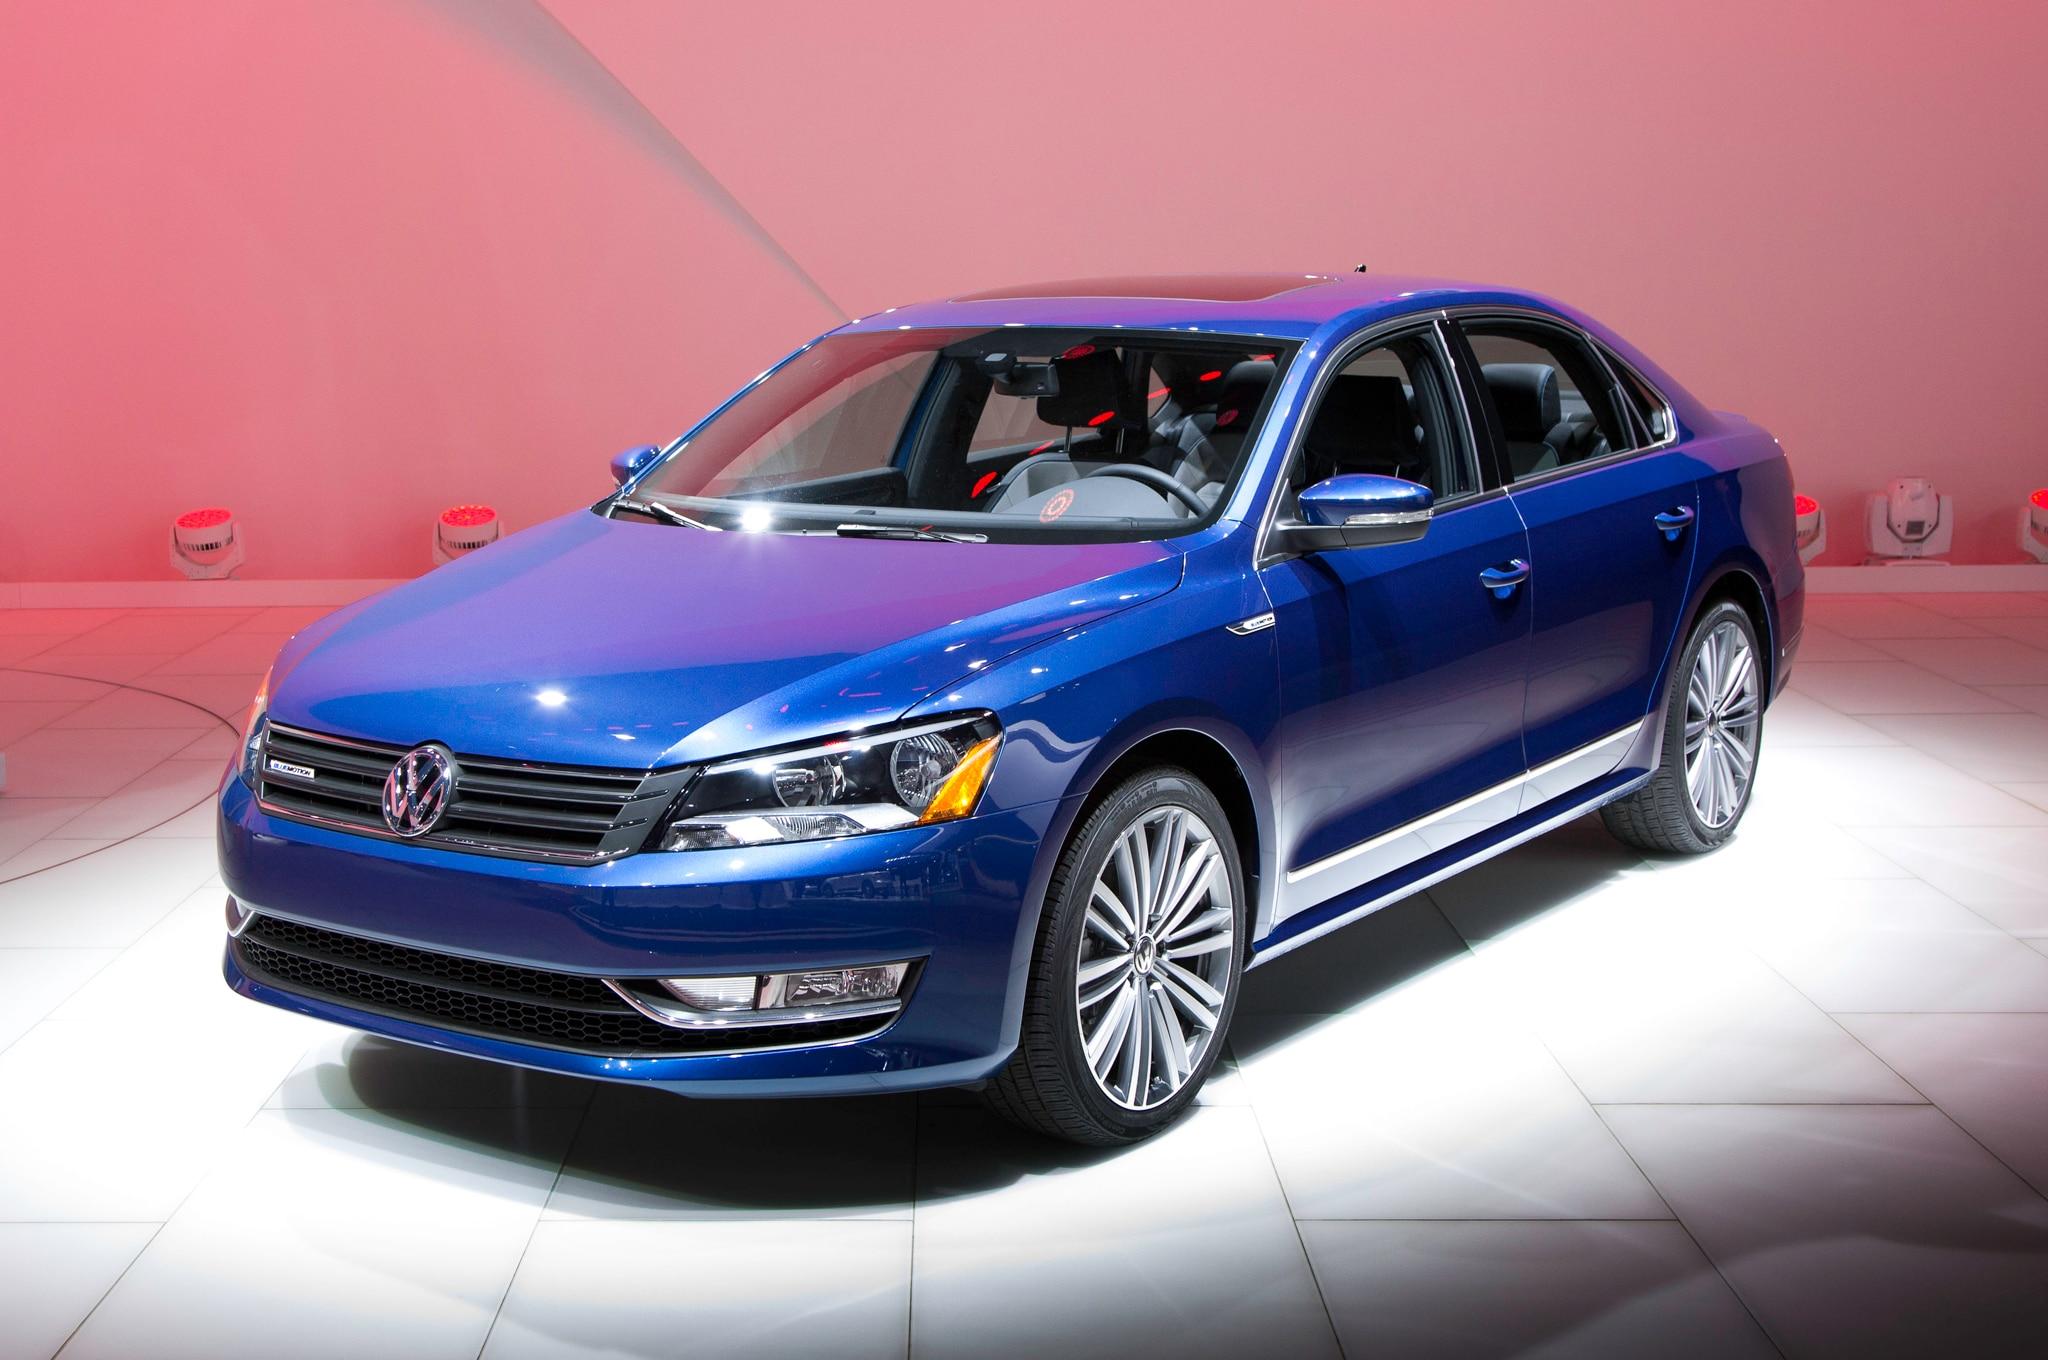 Volkswagen Passat BlueMotion Concept Front Three Quarters